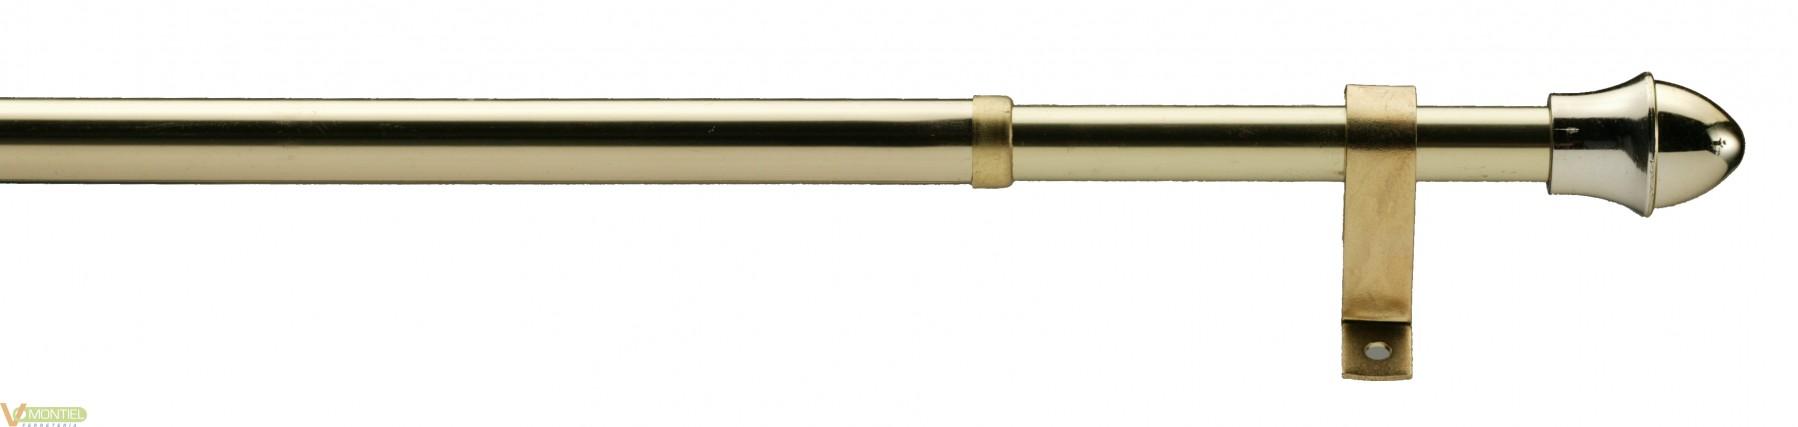 Portavisillo exten 70/125cm bi-0